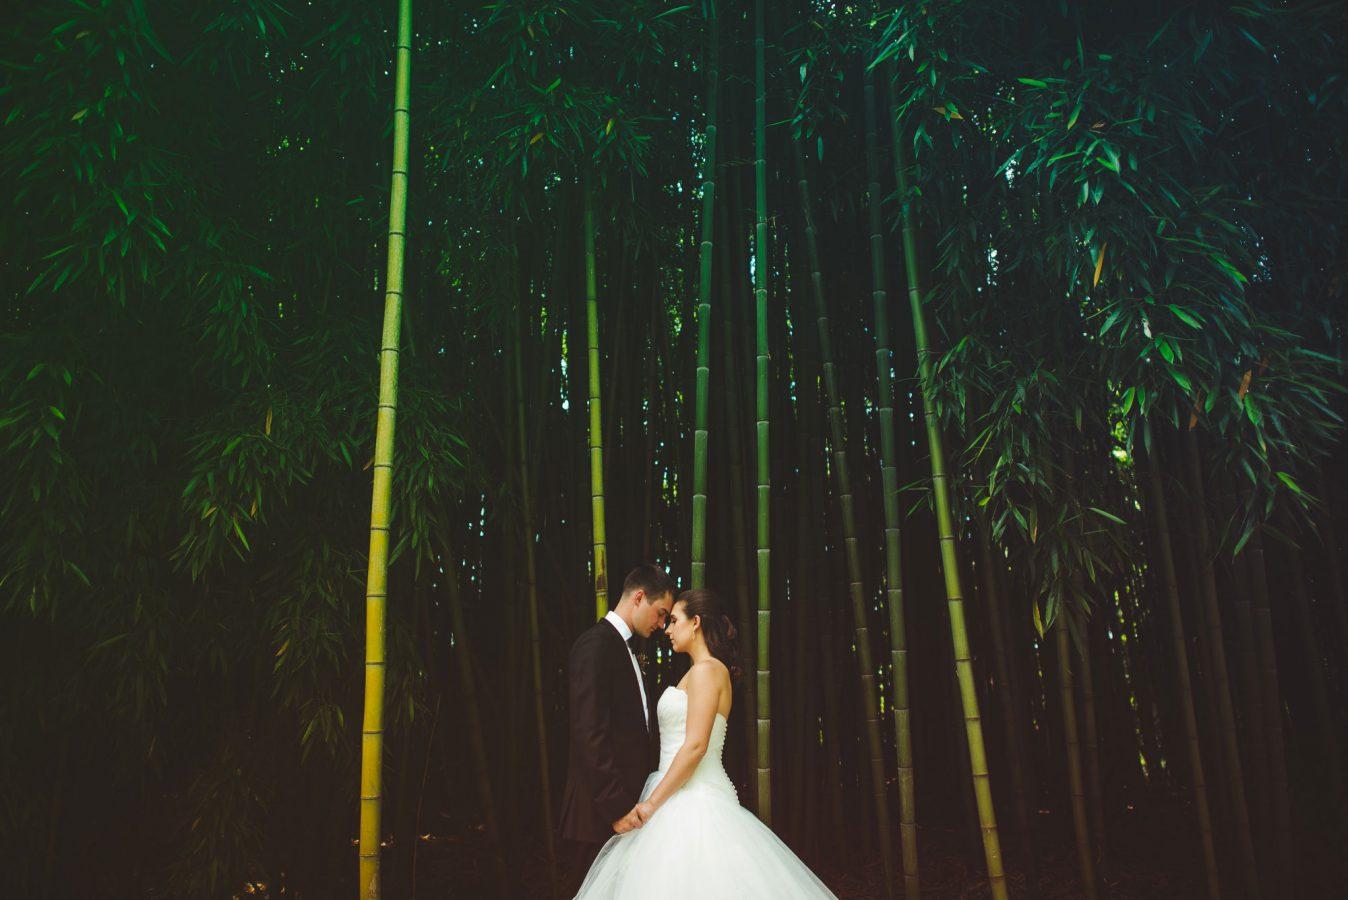 fete-photography-weddings-2017-013